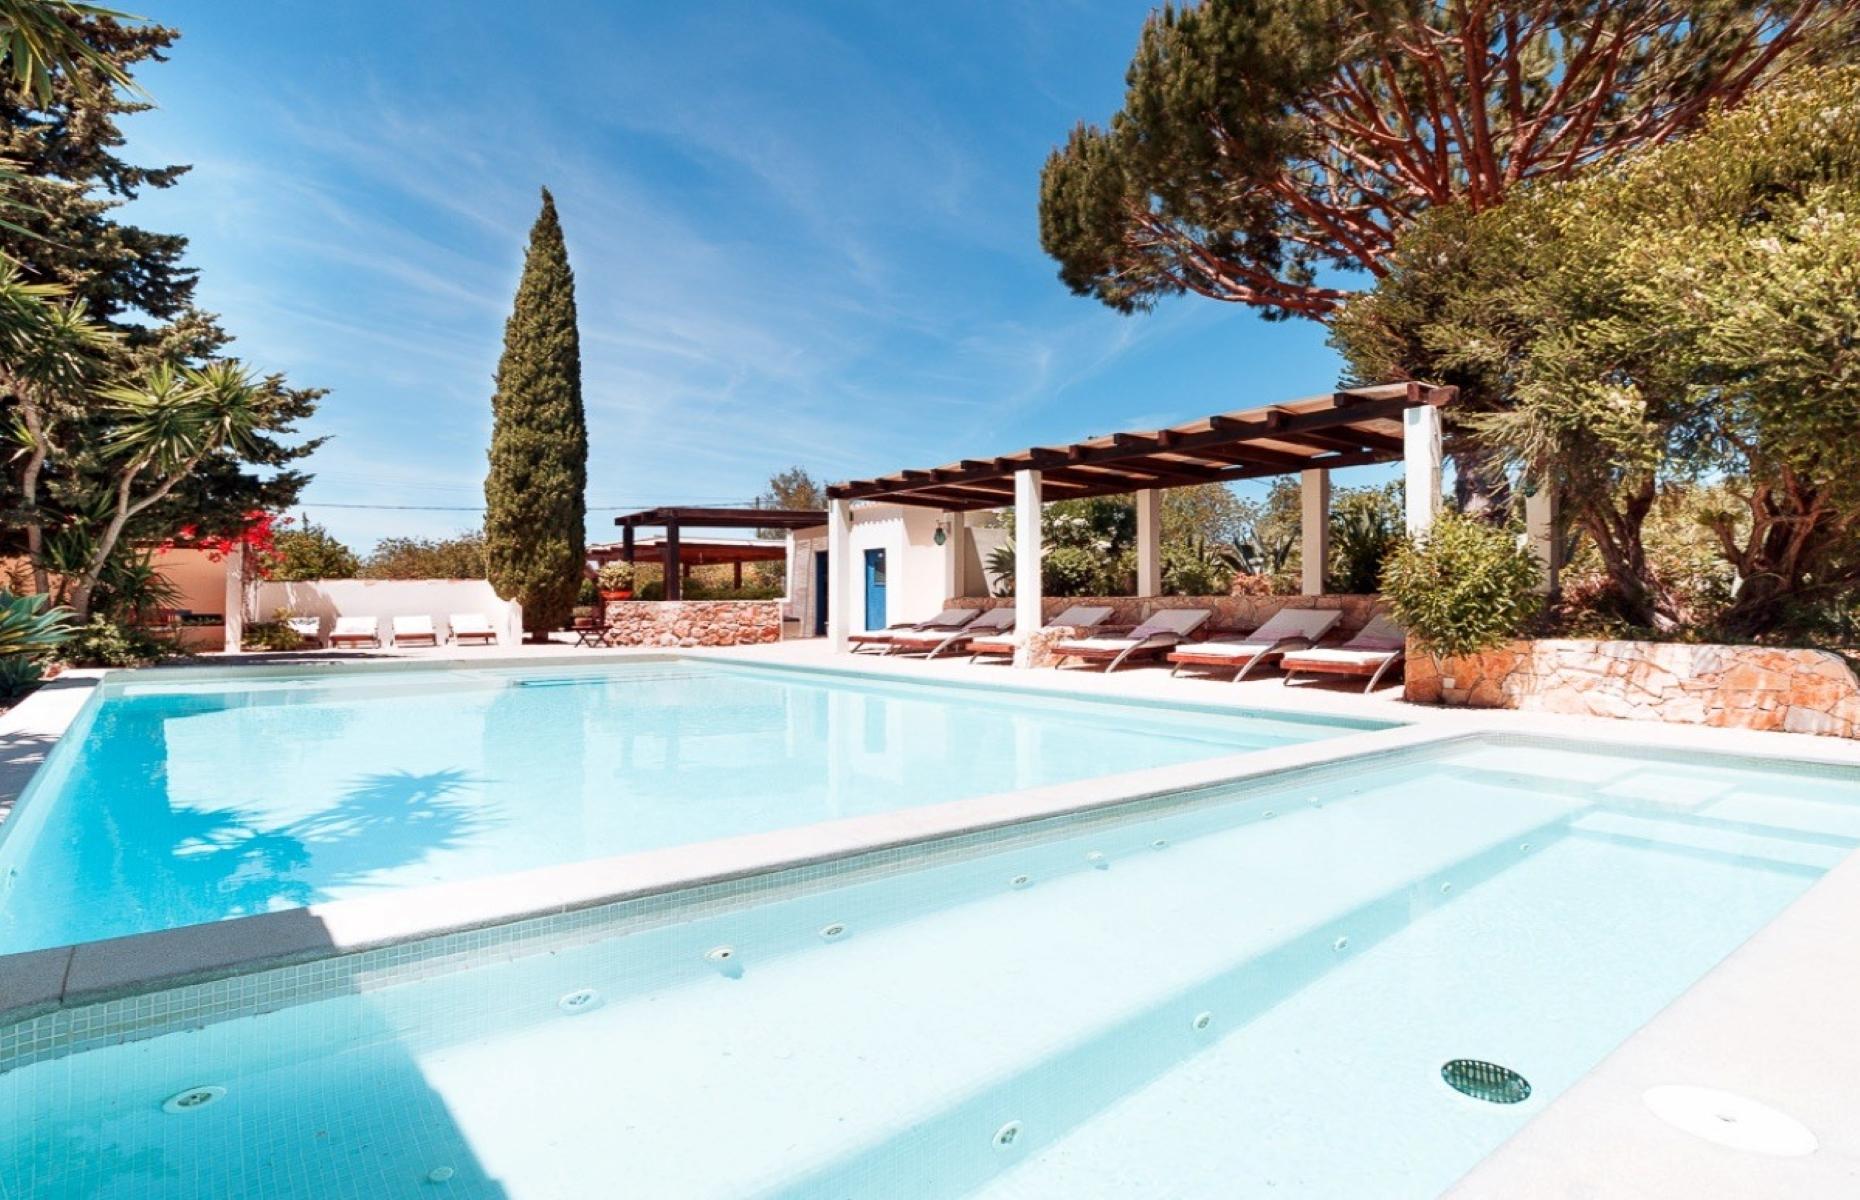 The pool at Casa Porta Azul (Image: Casa Porta Azul/Facebook)